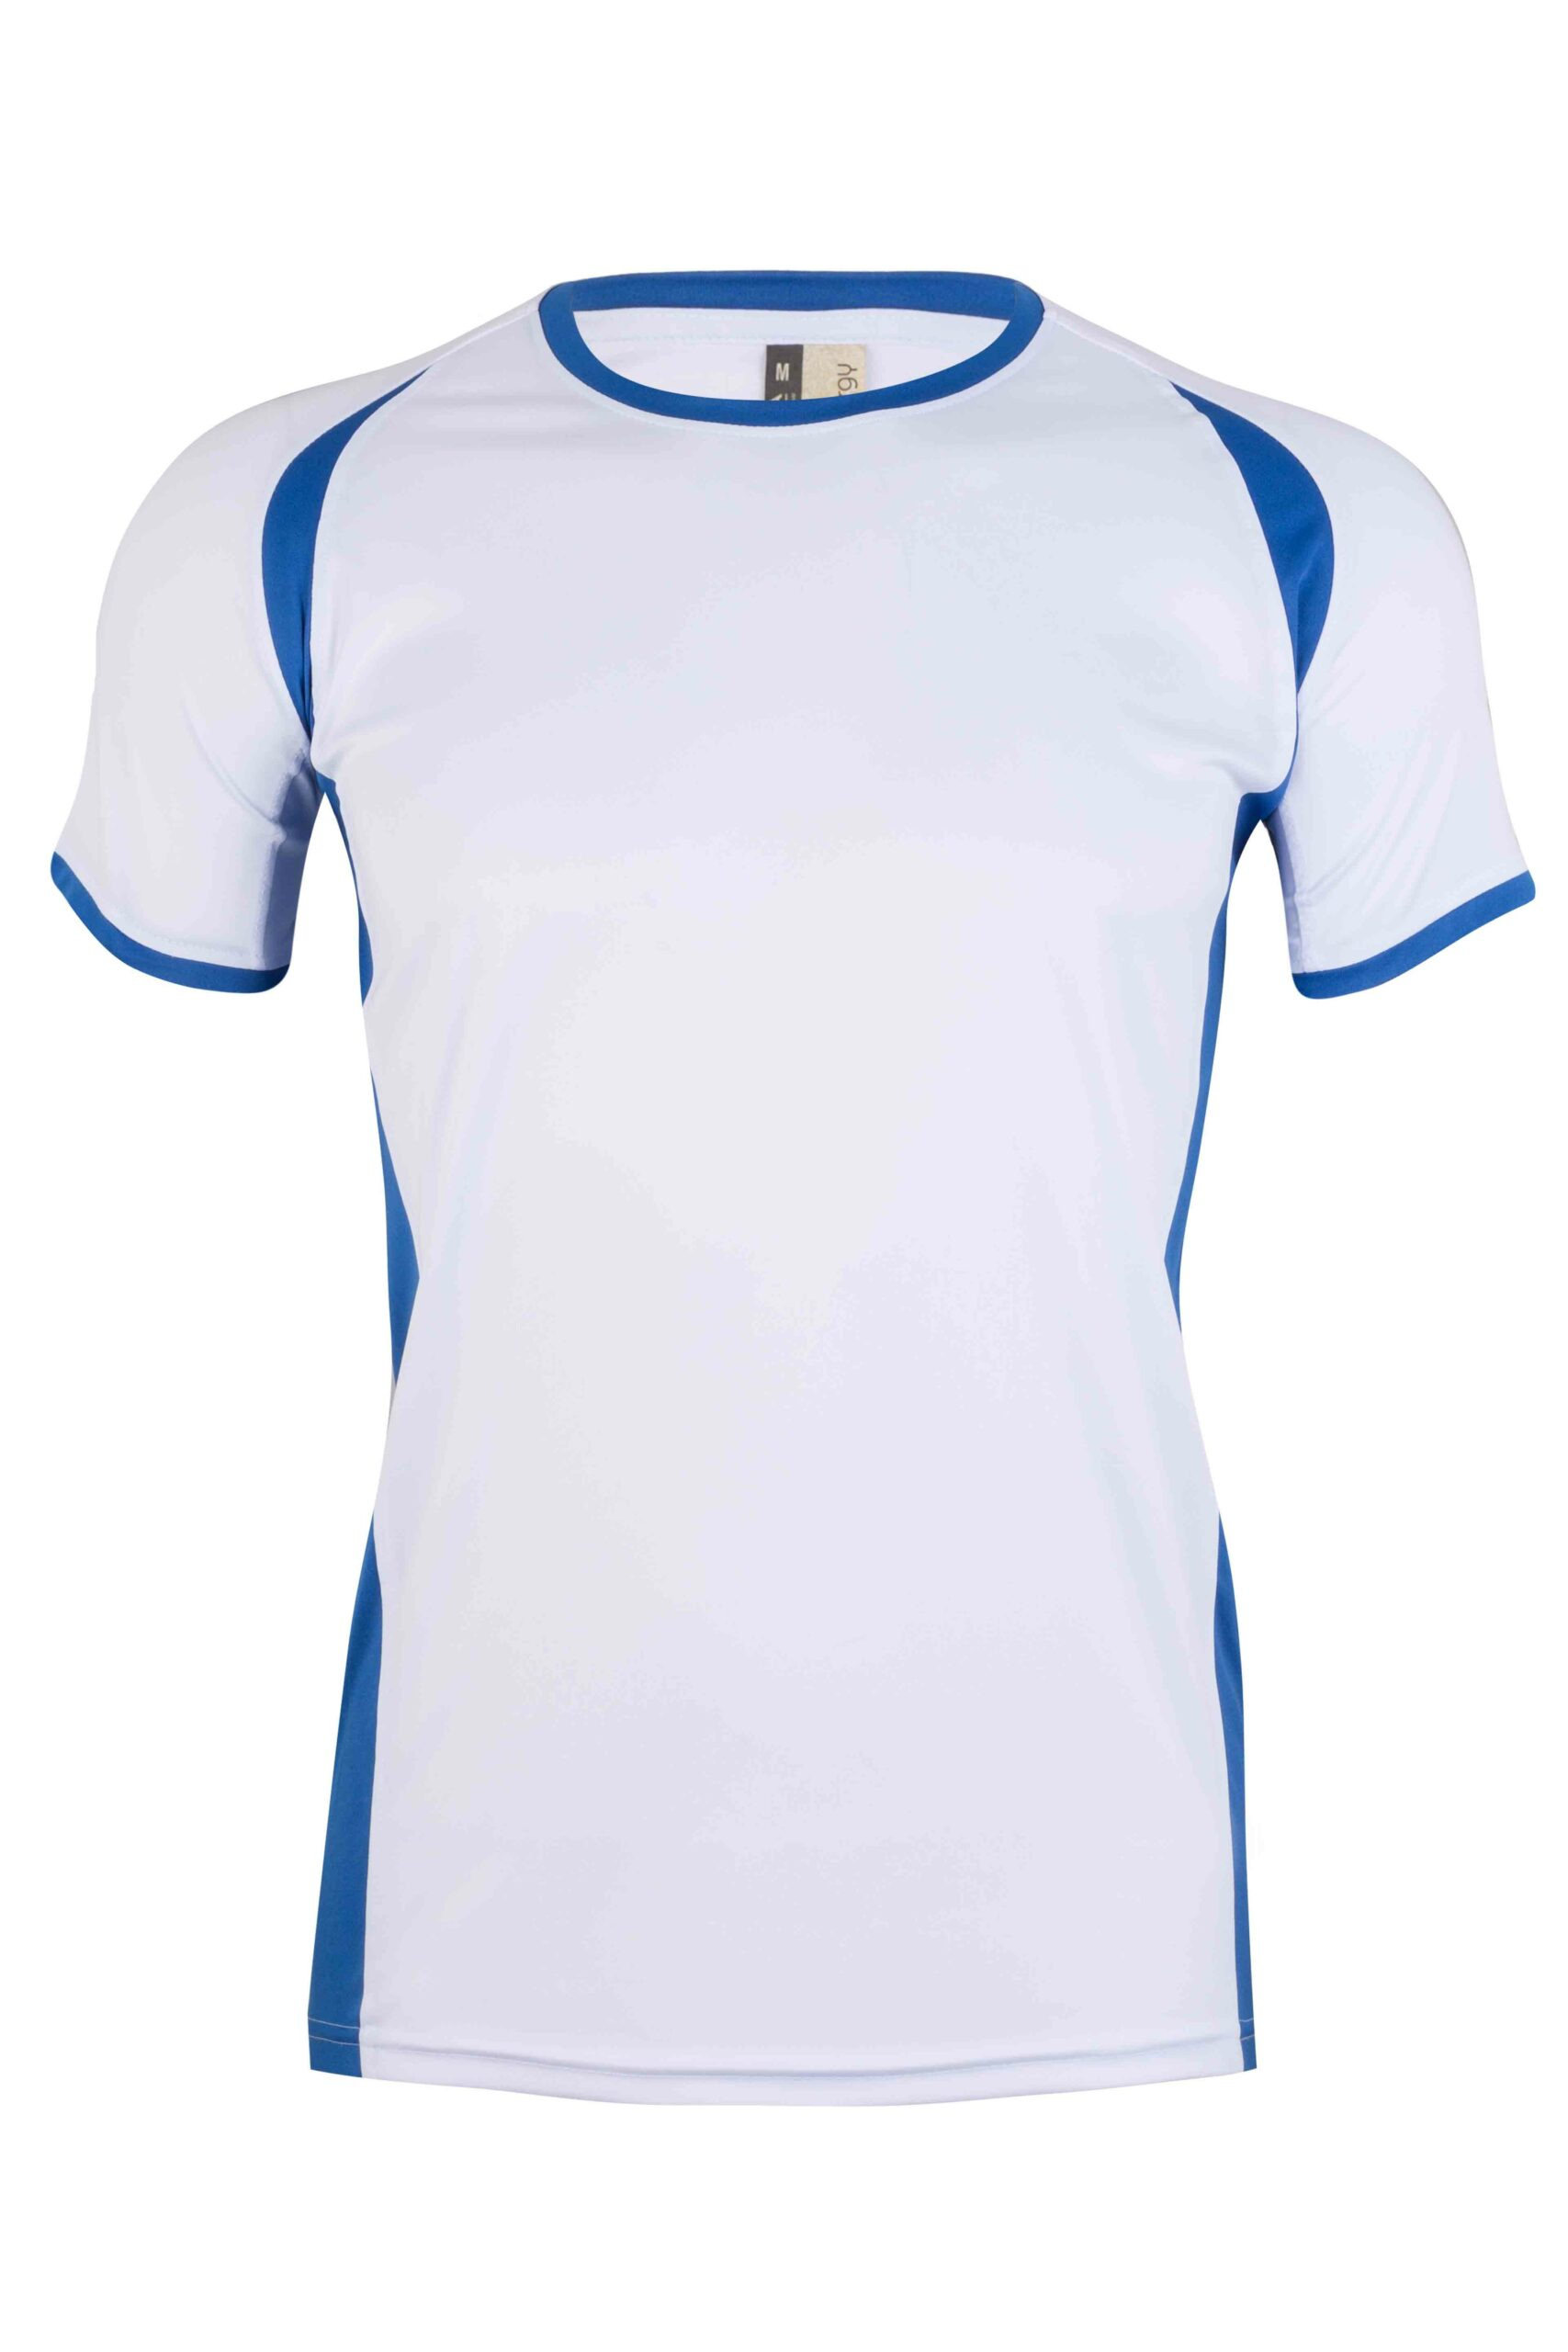 Mukua Mk530v Mukua Camiseta TÉcnica Manga Corta Bicolor White Royal Blue 1